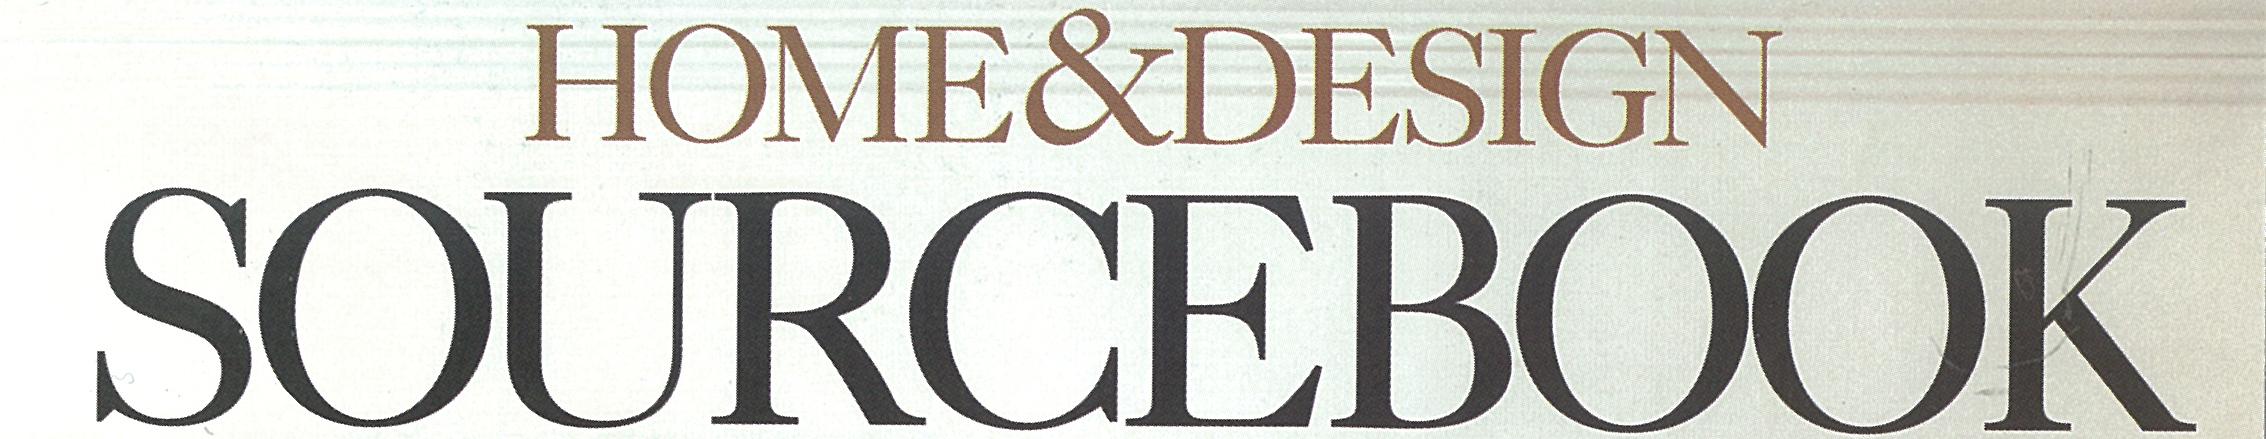 Home & Design Sourcebook Logo